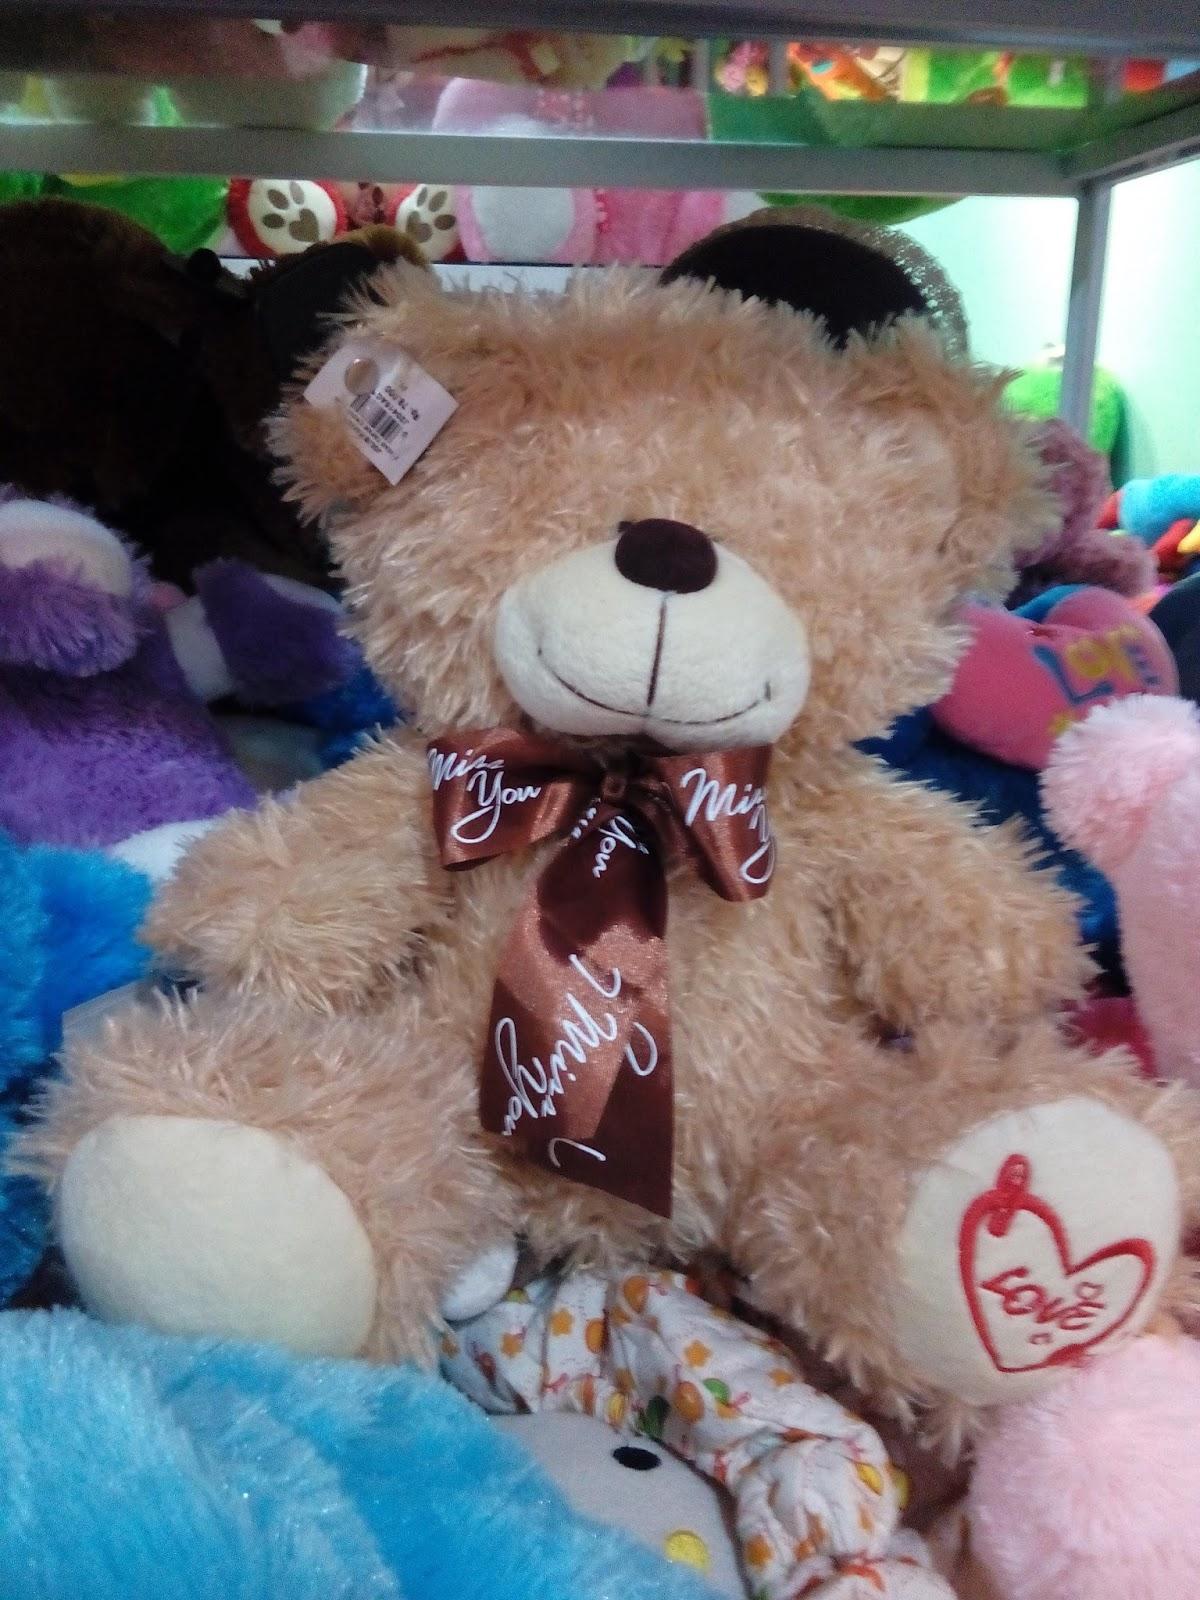 boneka teddy bear kecil imut lucu Jolie Jogja Wirobrajan